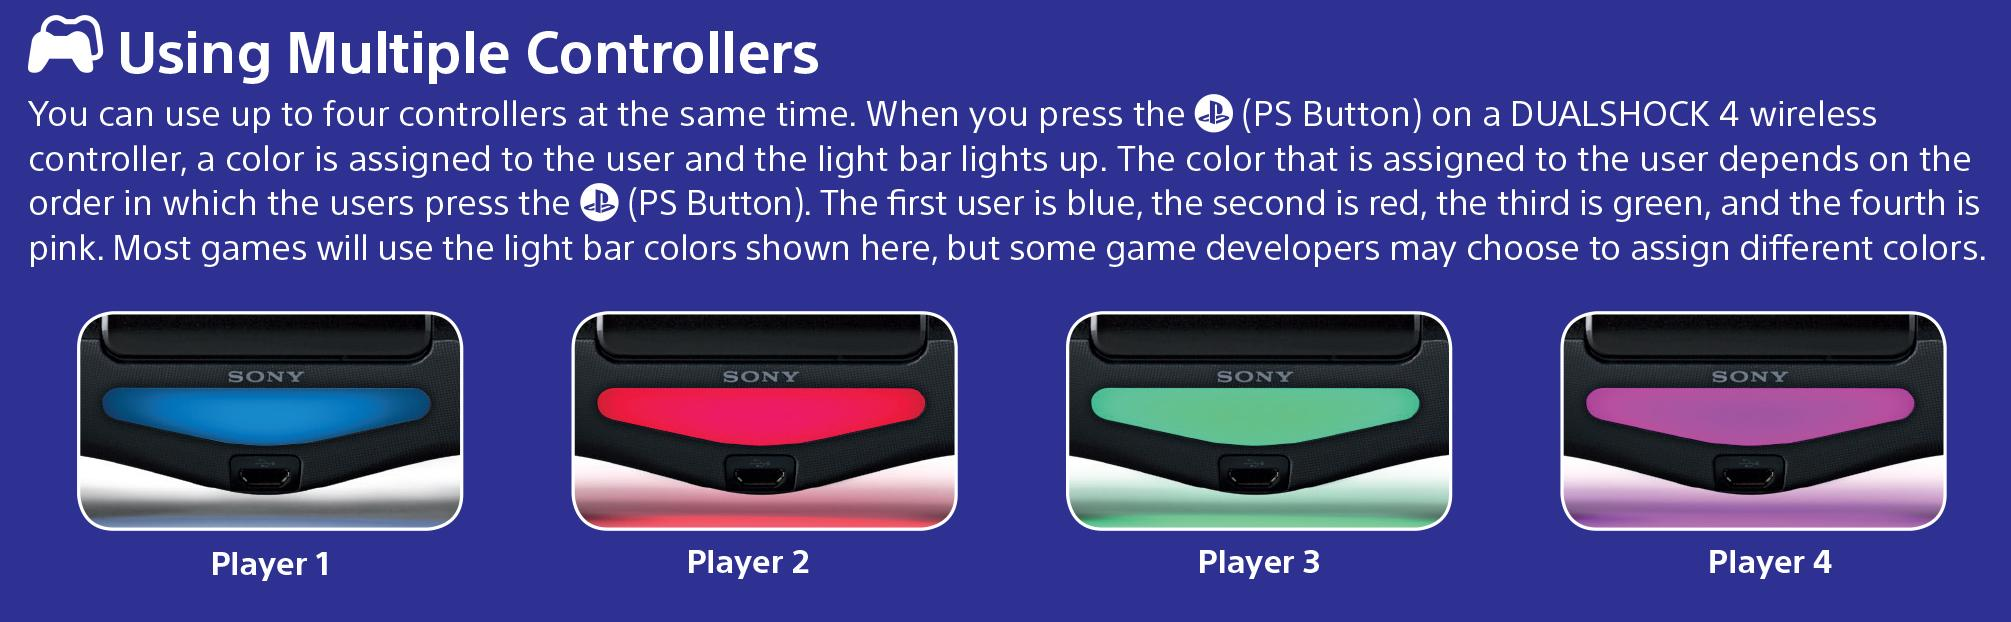 Amazon.com: DualShock 4 Wireless Controller for ...